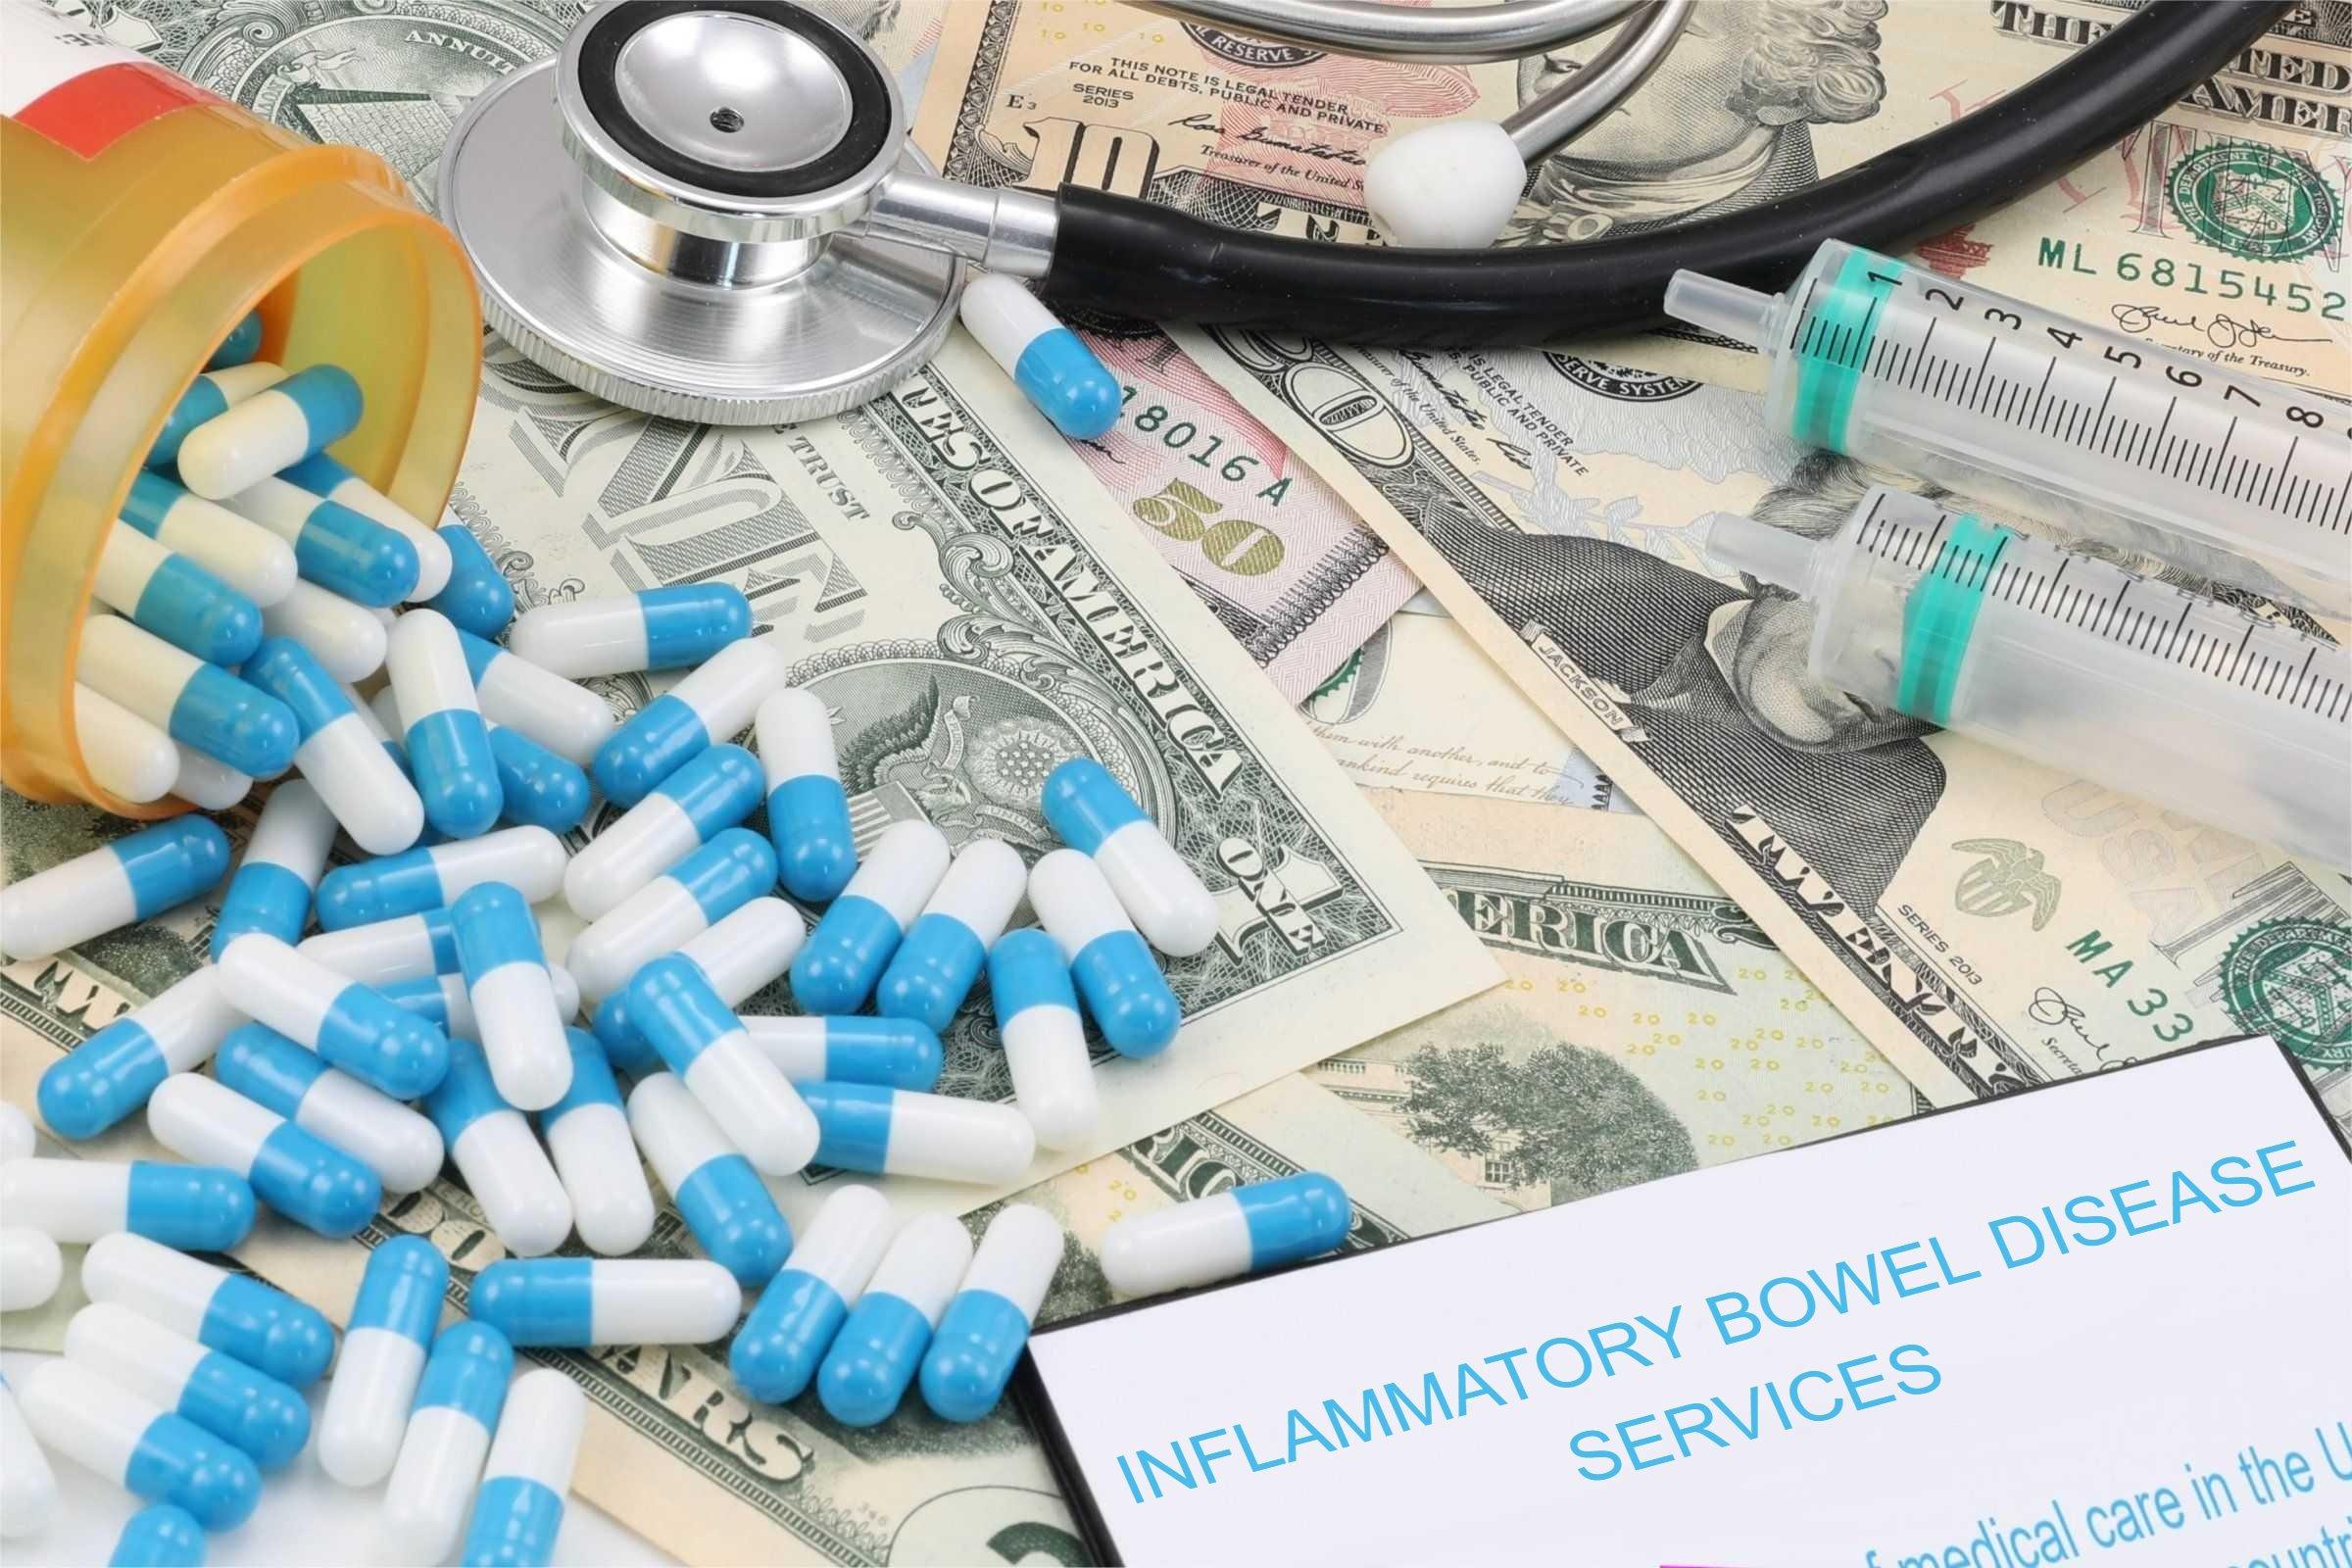 Inflammatory Bowel Disease Services